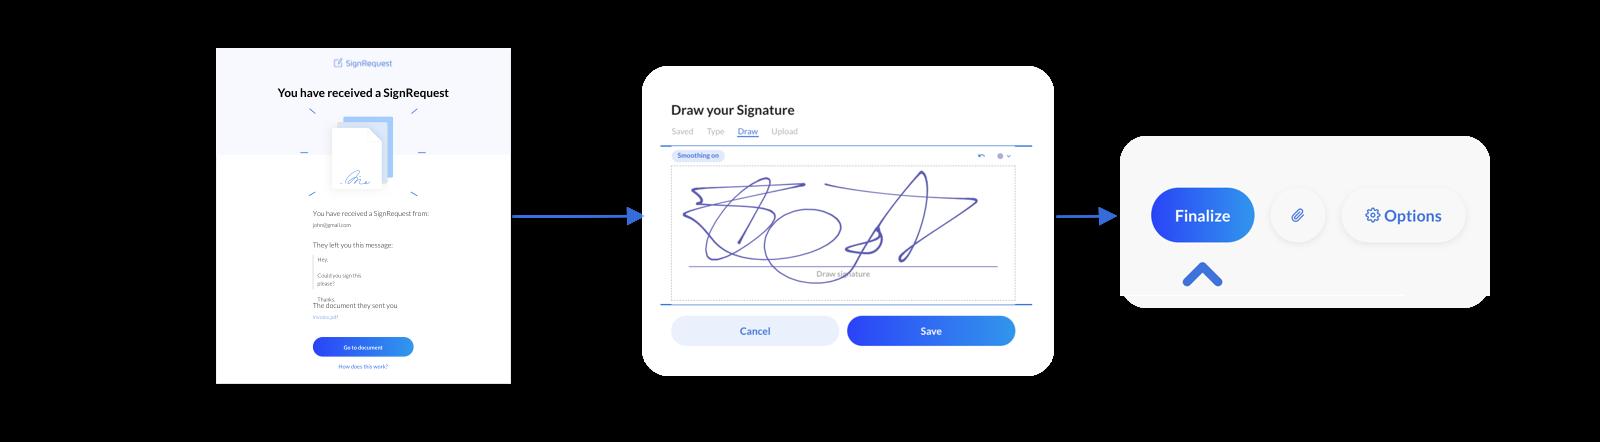 Sign a PDF online using SignRequest